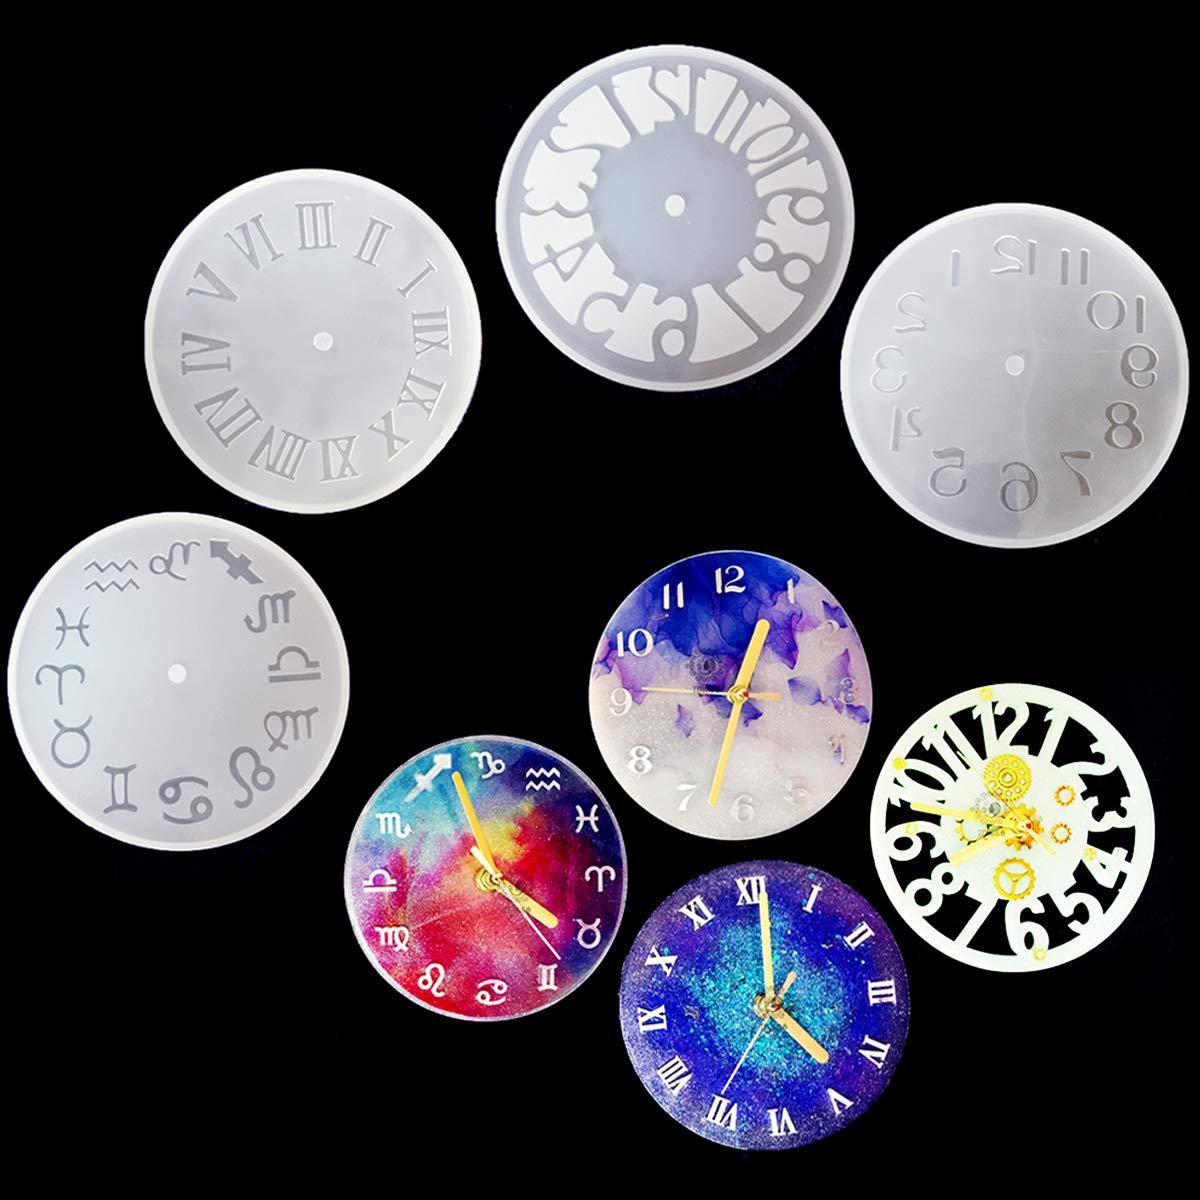 4 moldes para resina epoxy relojes de 15cm de diametro